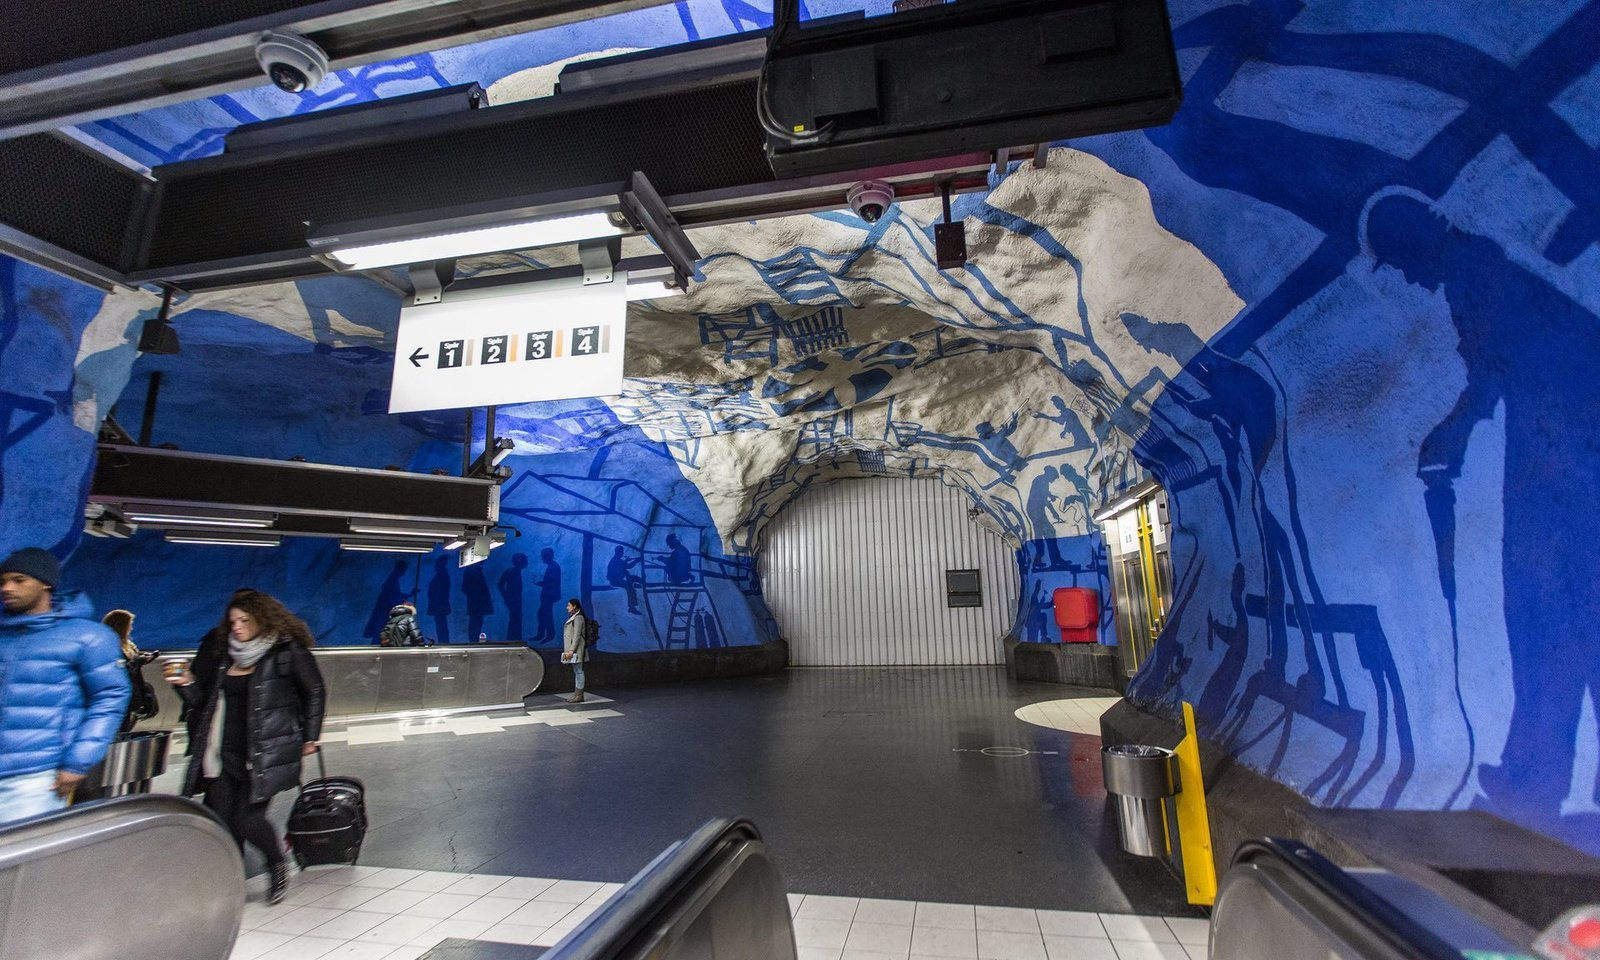 Photo 10 of 10 in Explore the Stockholm Metro For a Tour Through 5 Decades of European Art History